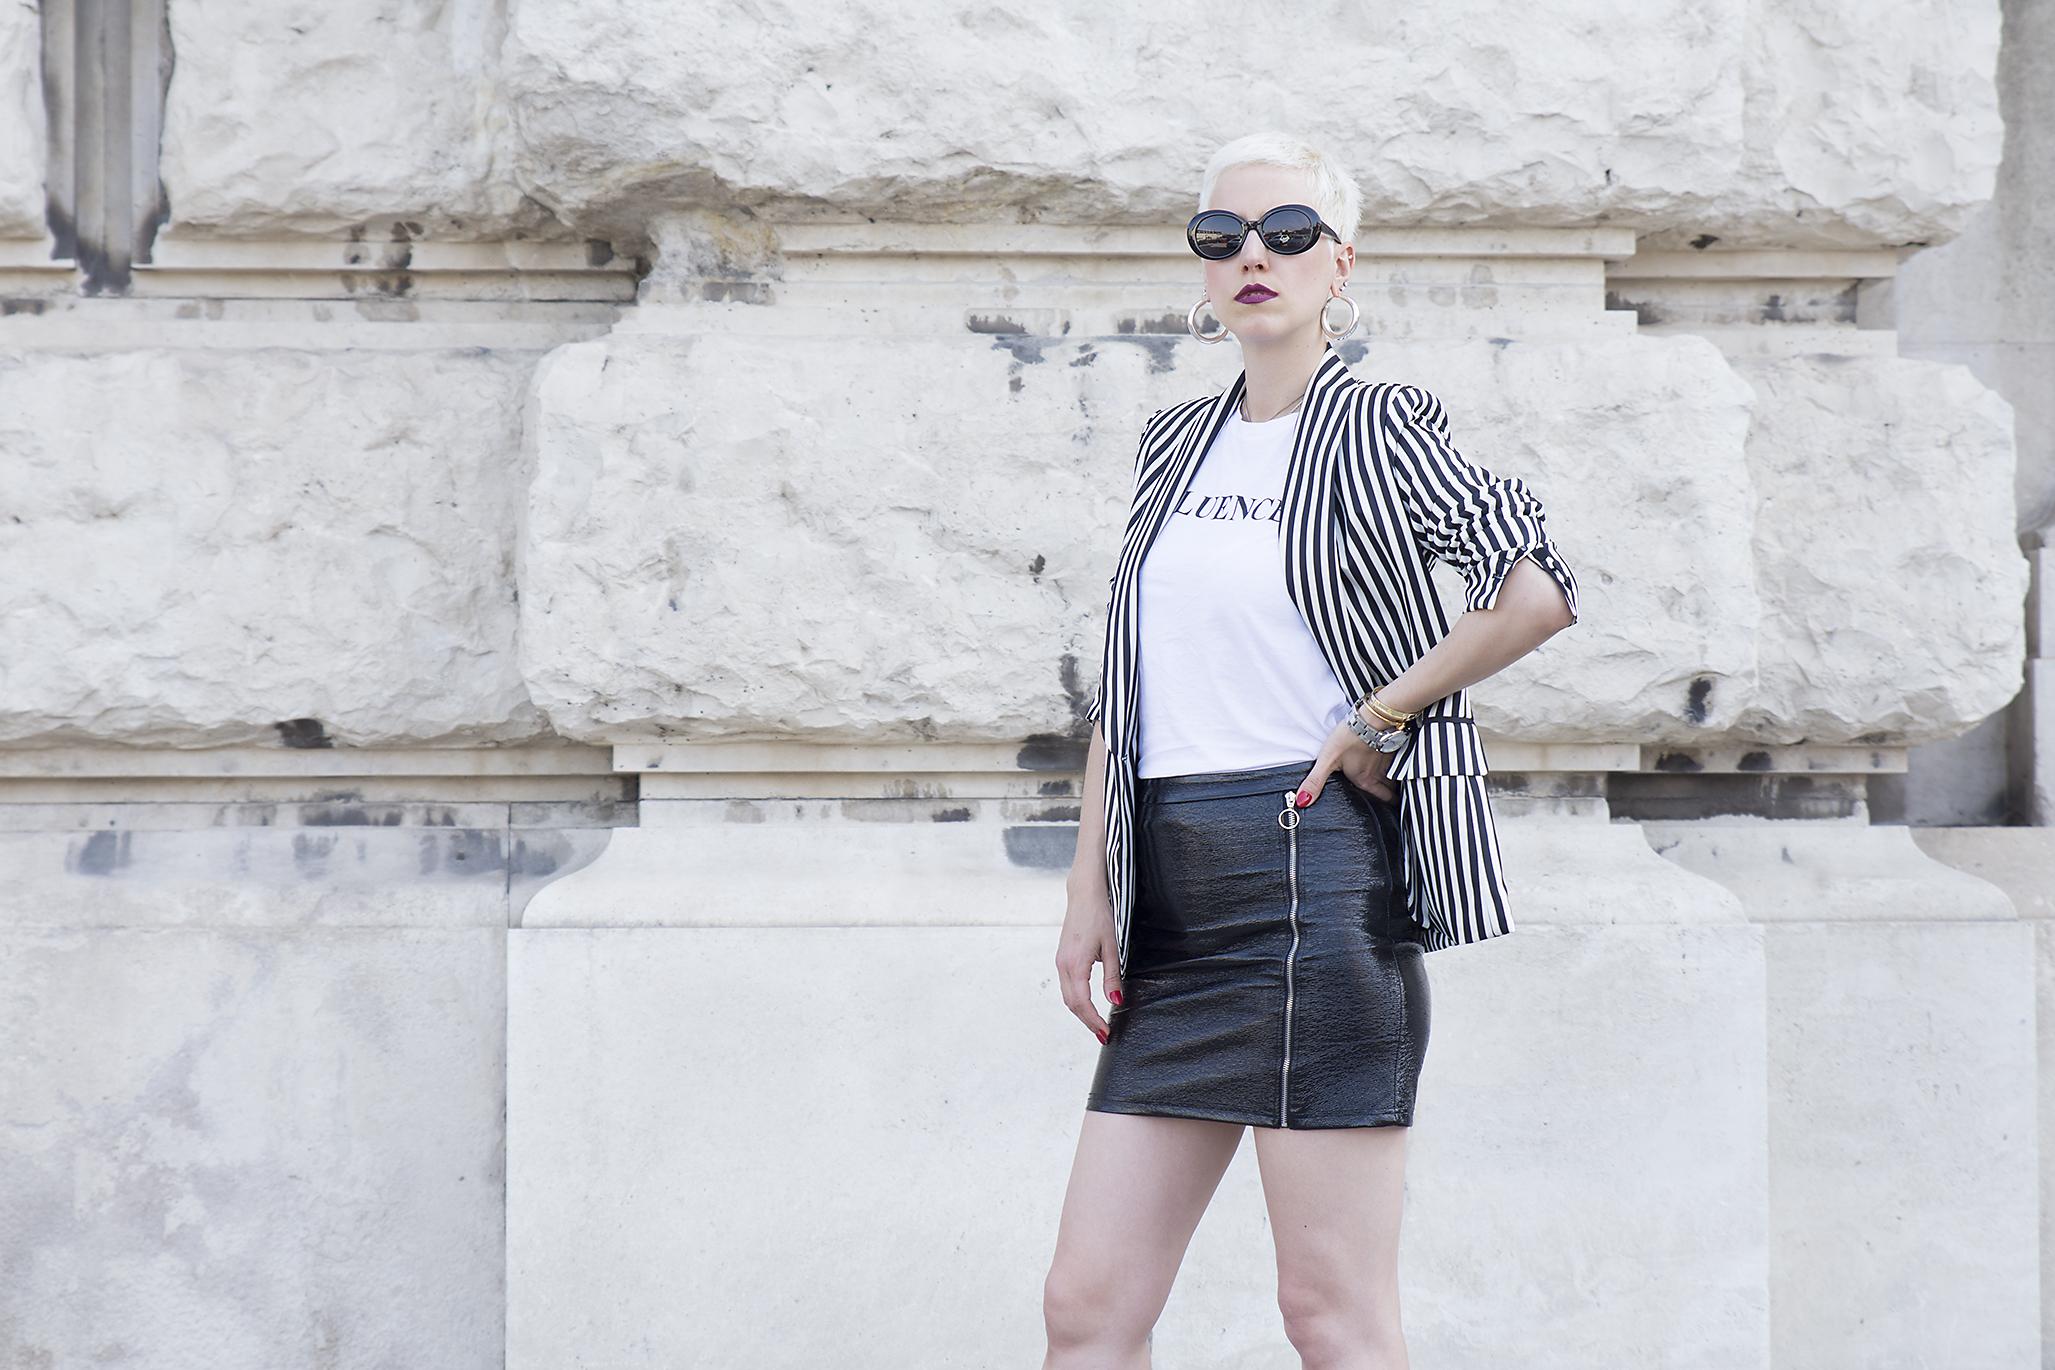 90's style sunglasses